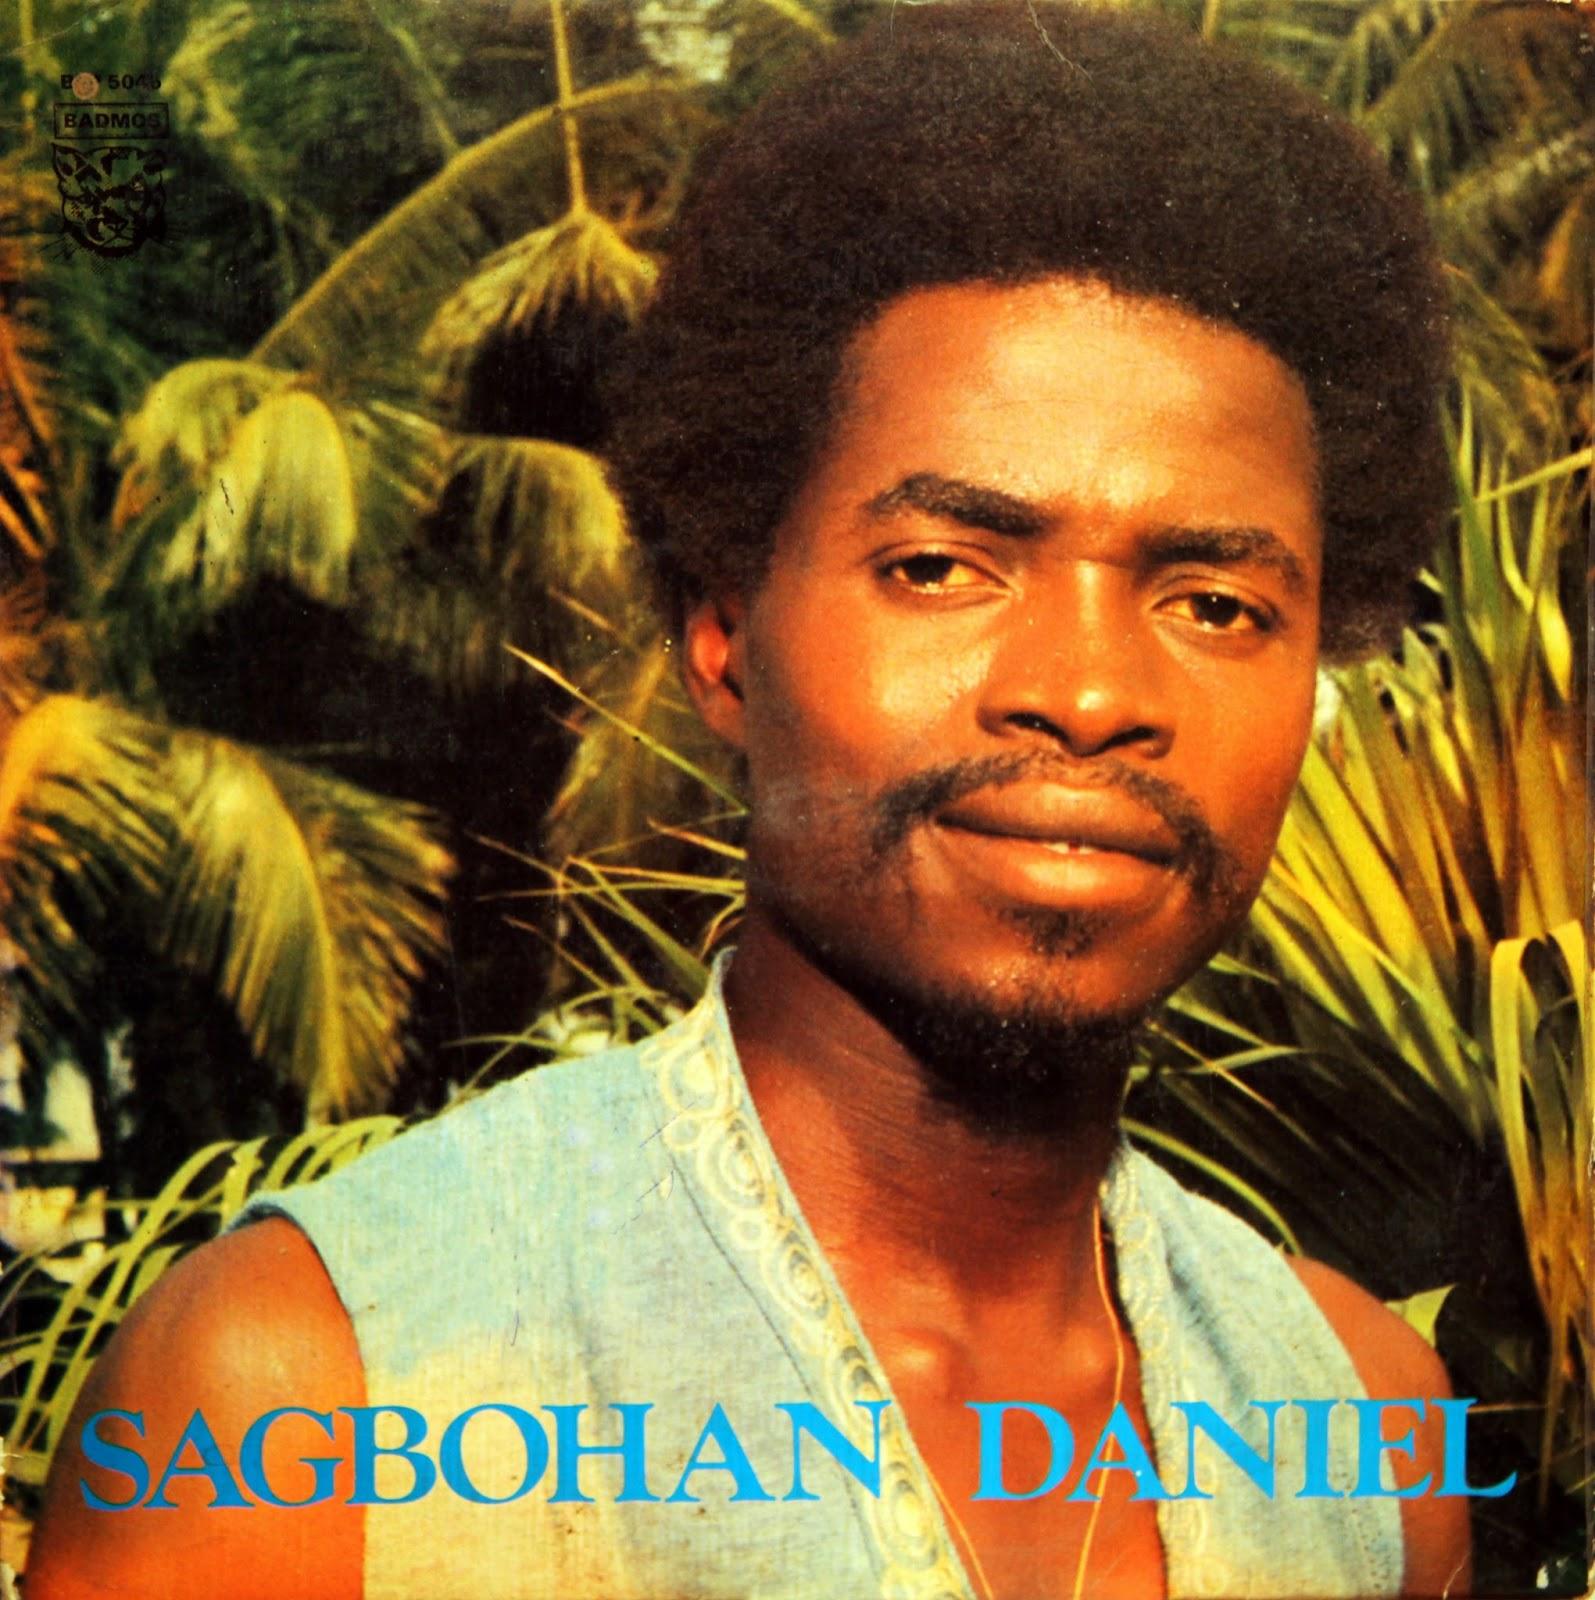 oro: Daniel Sagbohan (1977)